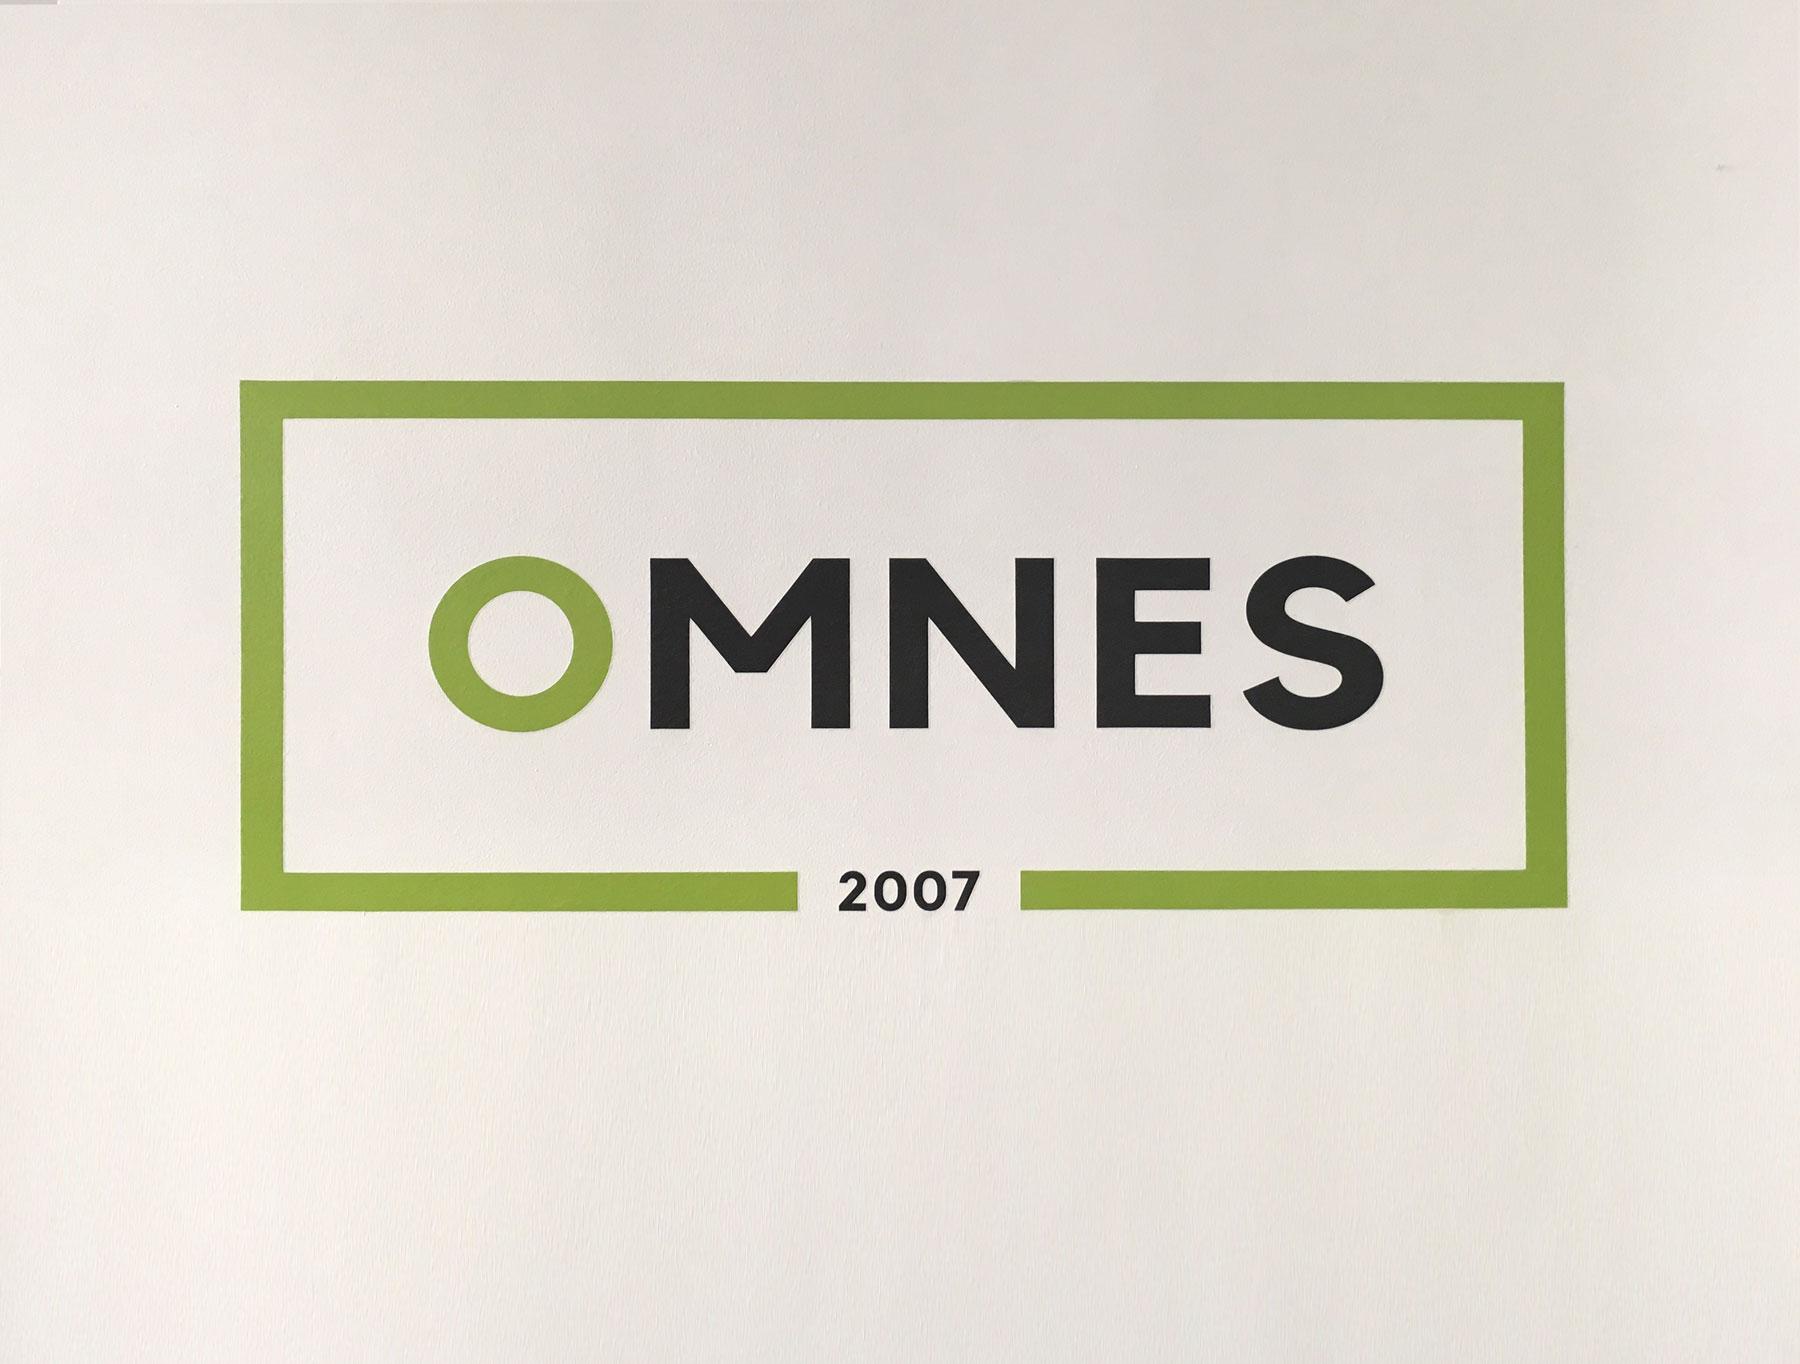 OMNES Werbeagentur